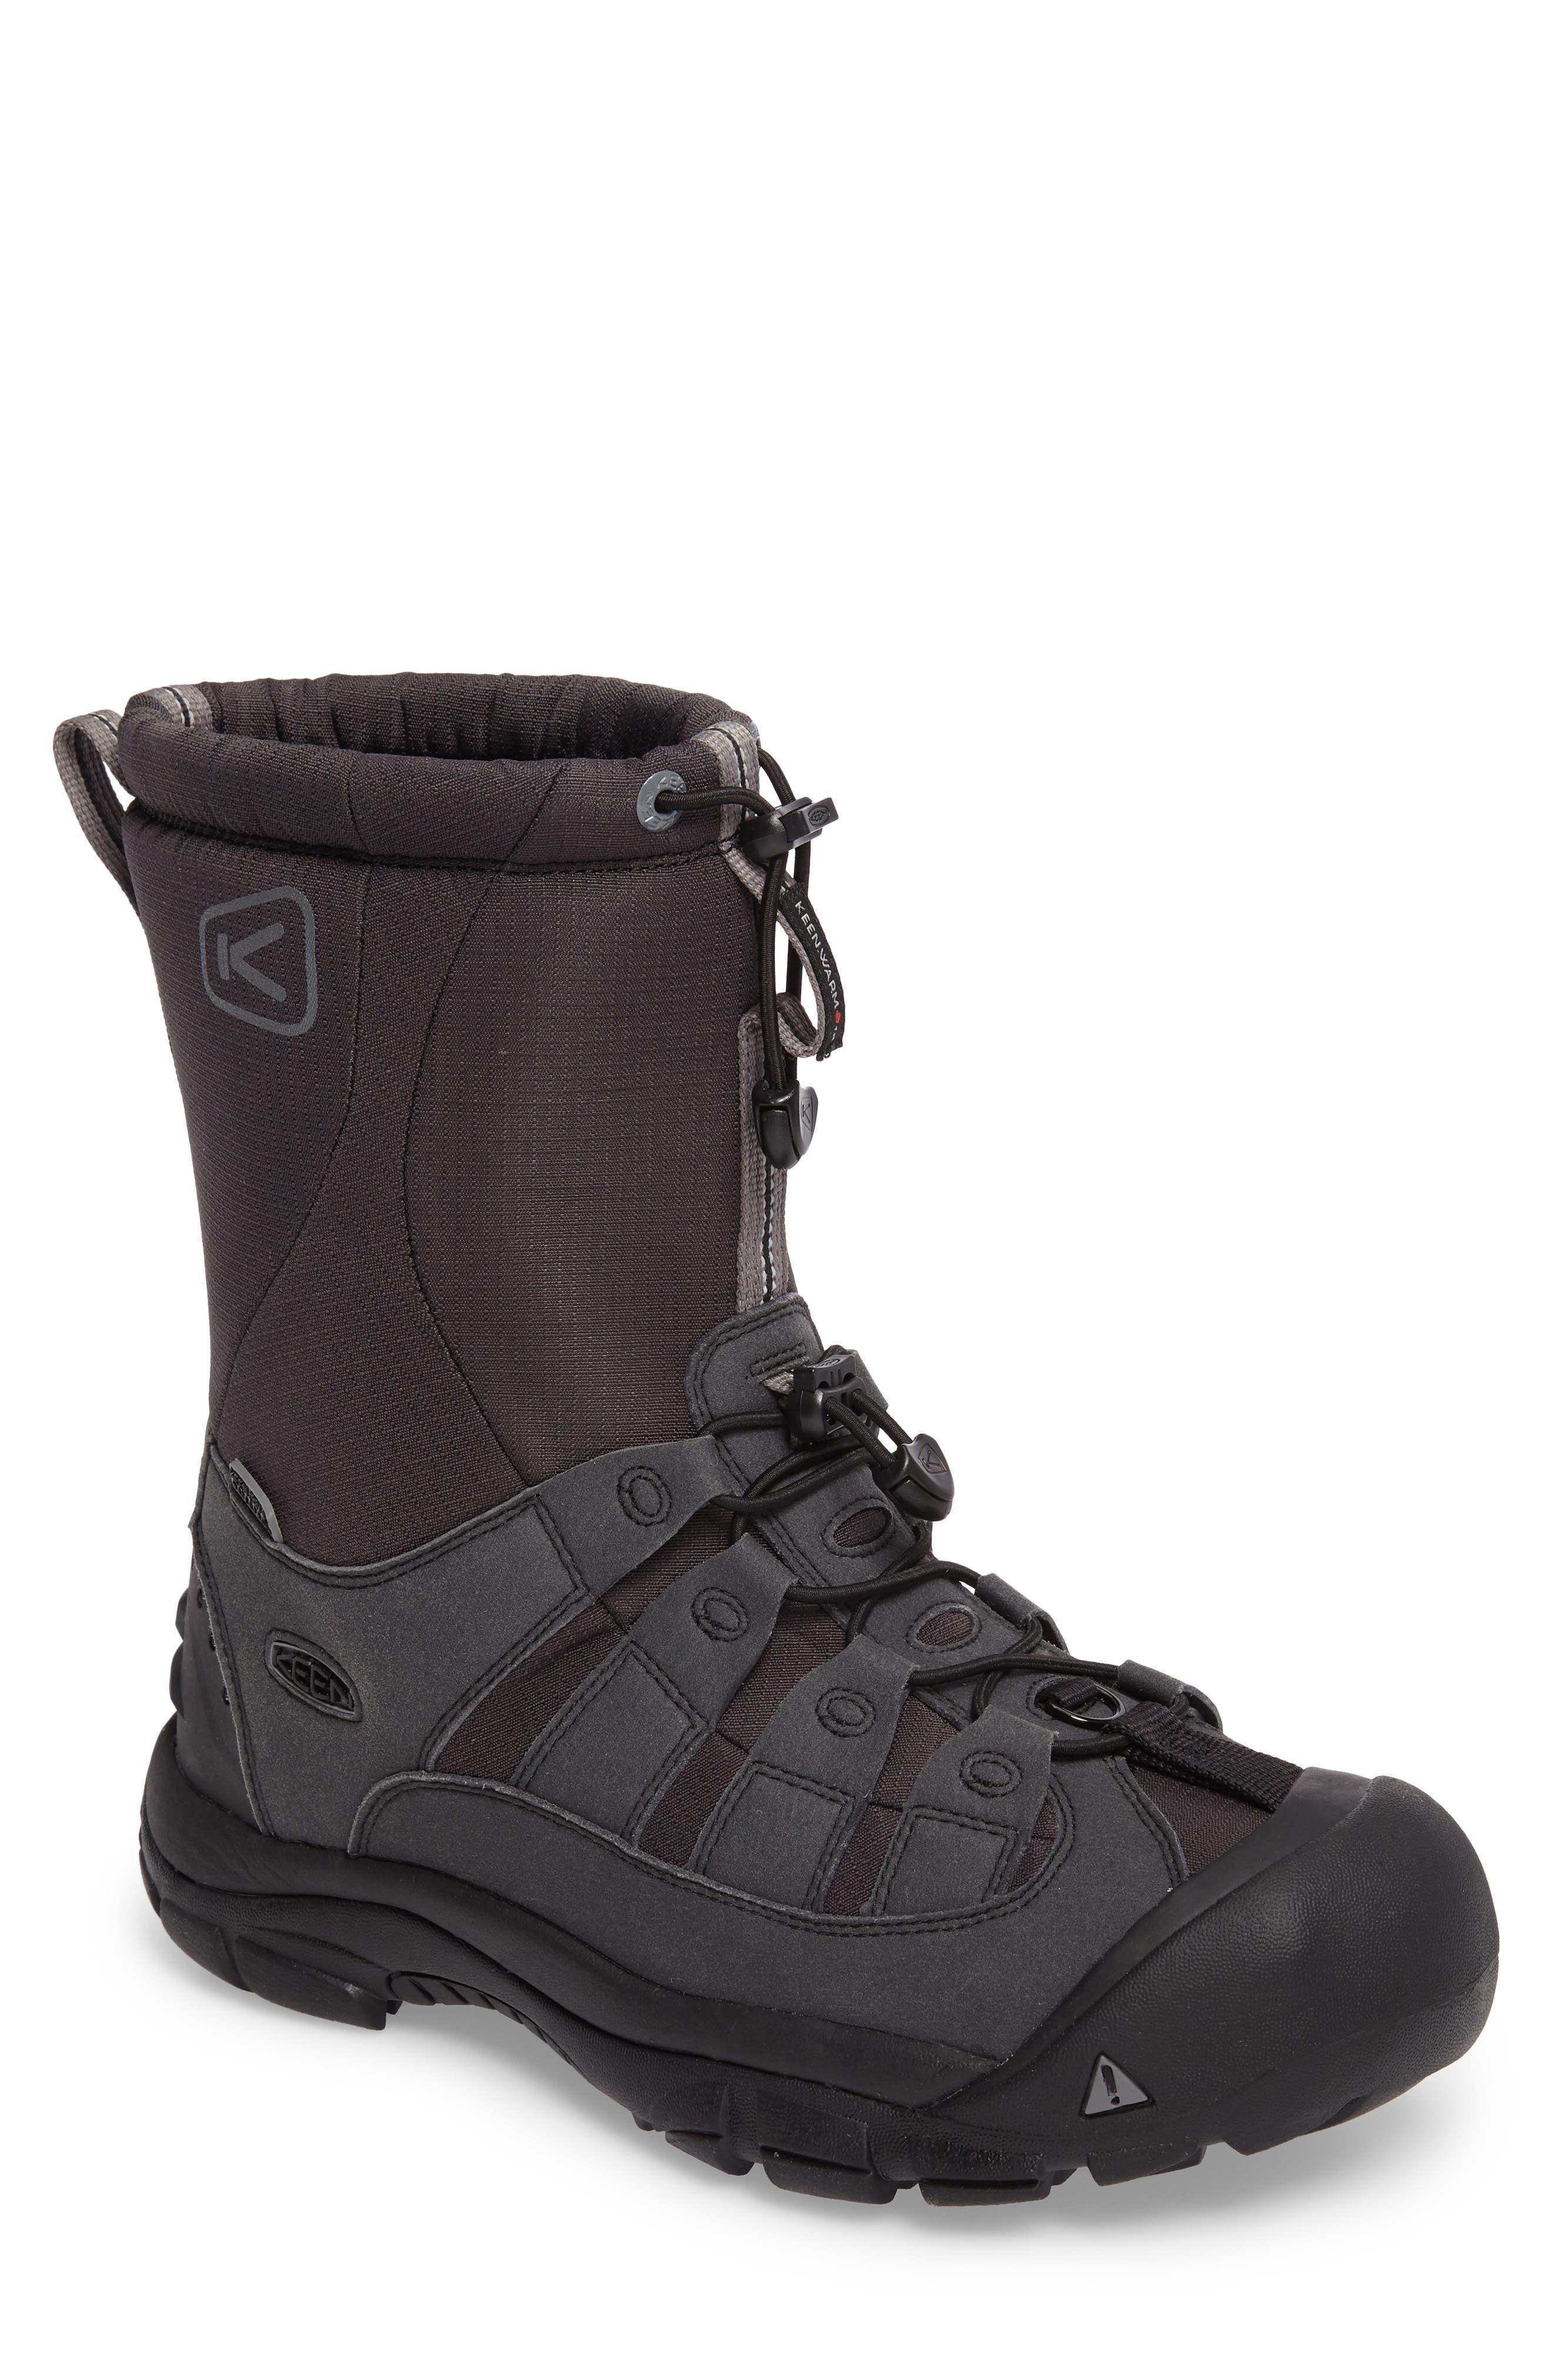 Winterport II Waterproof Insulated Snow Boot,                         Main,                         color, 001